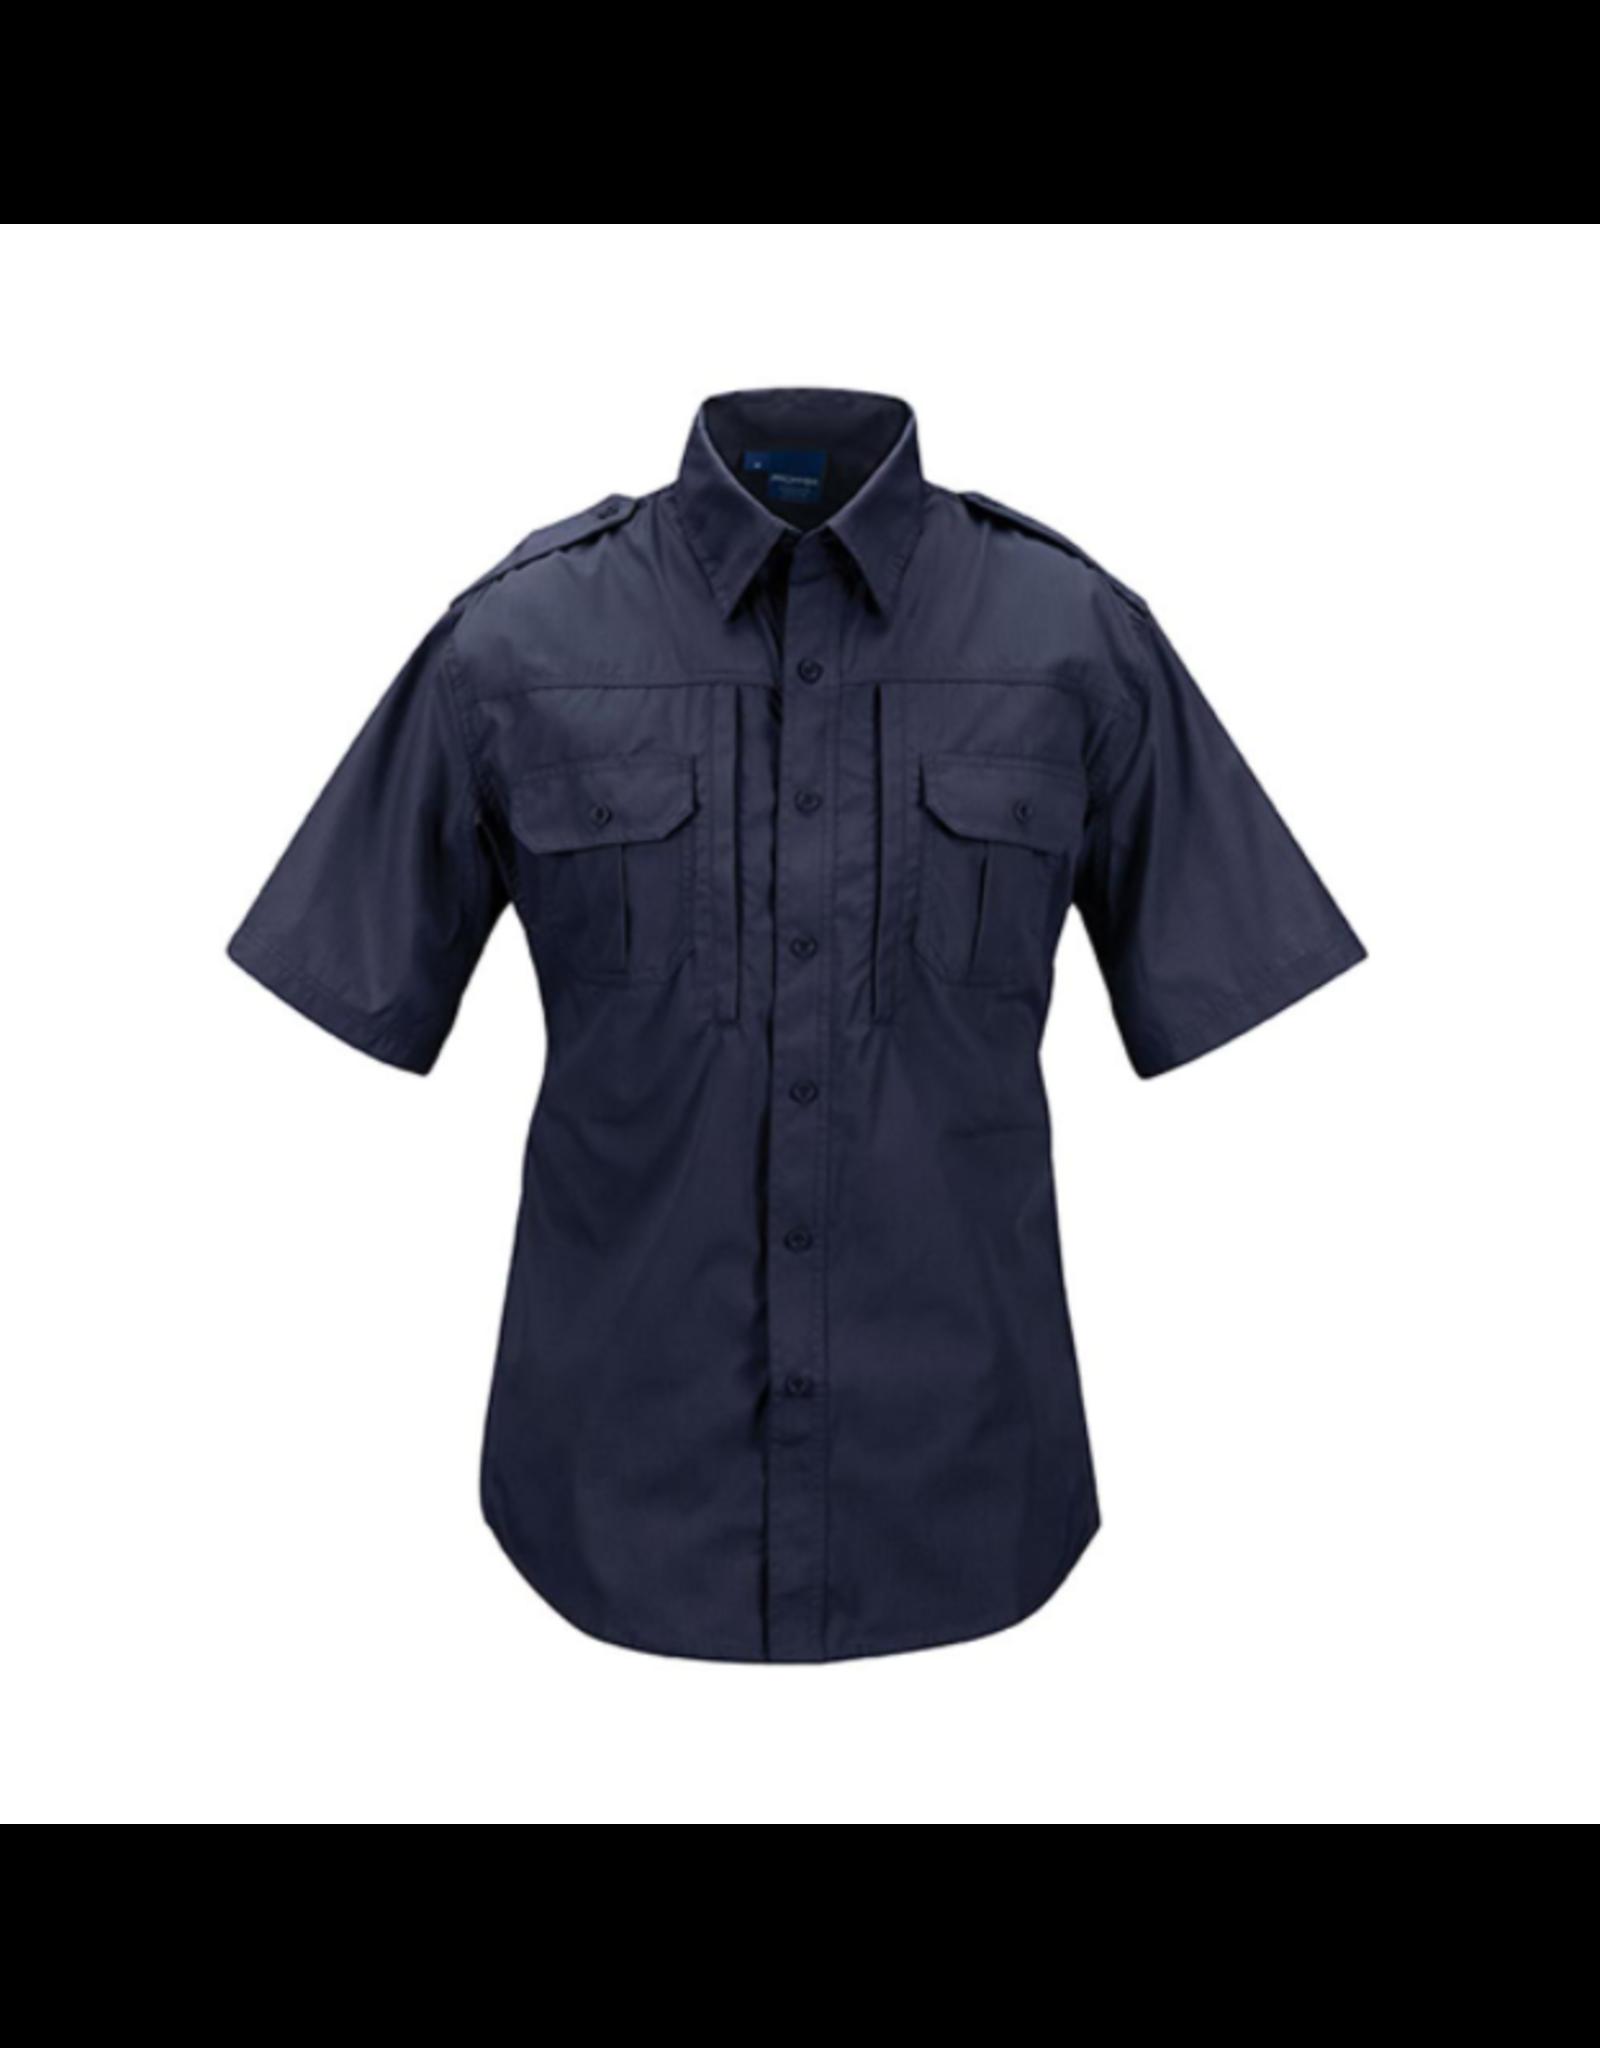 Propper Men's Duty Shirt Midnight Blue Large